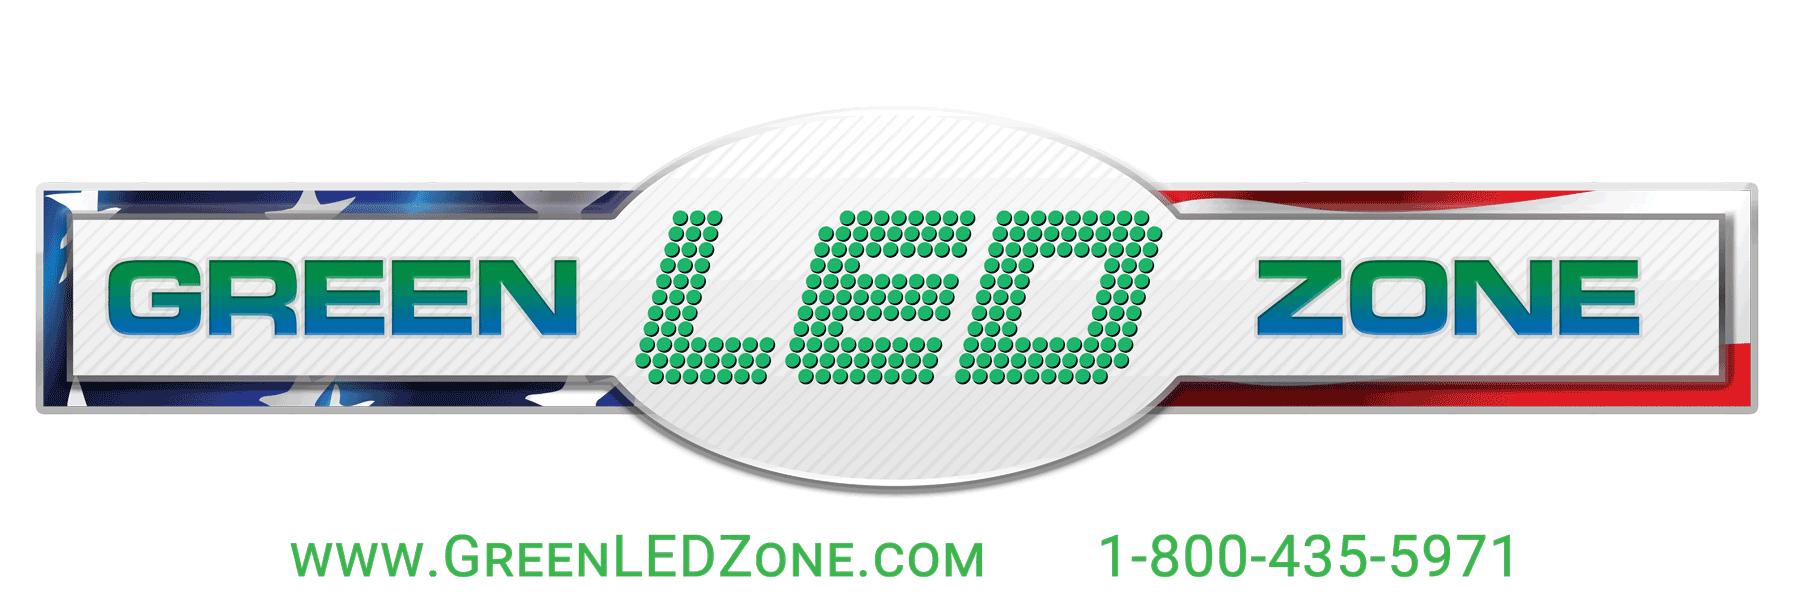 Green LED Zone Logo